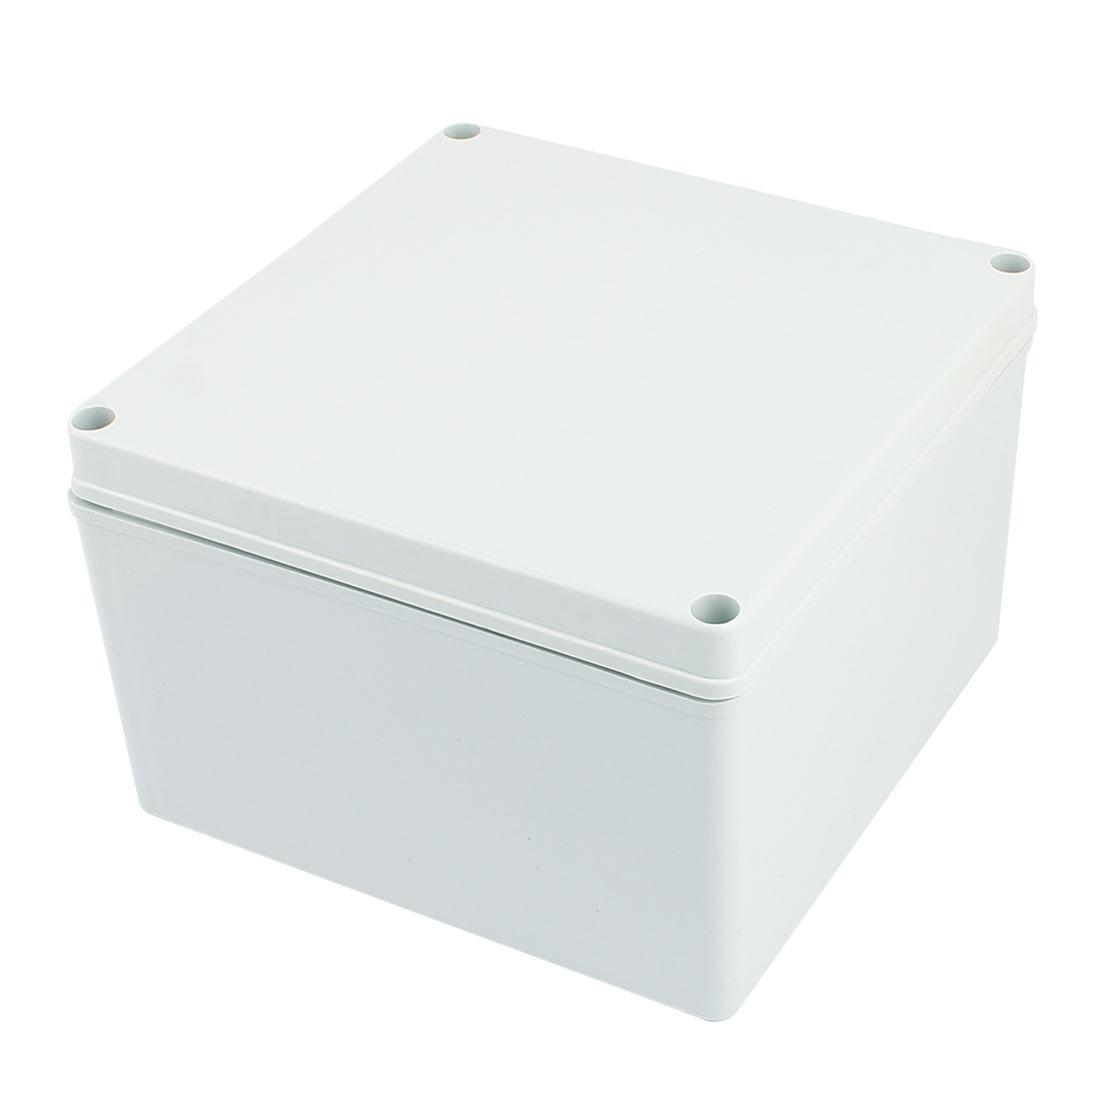 Dustproof IP65 Junction Box DIY Terminal Connection Enclosure Adaptable 192mm x192mm x 122mm